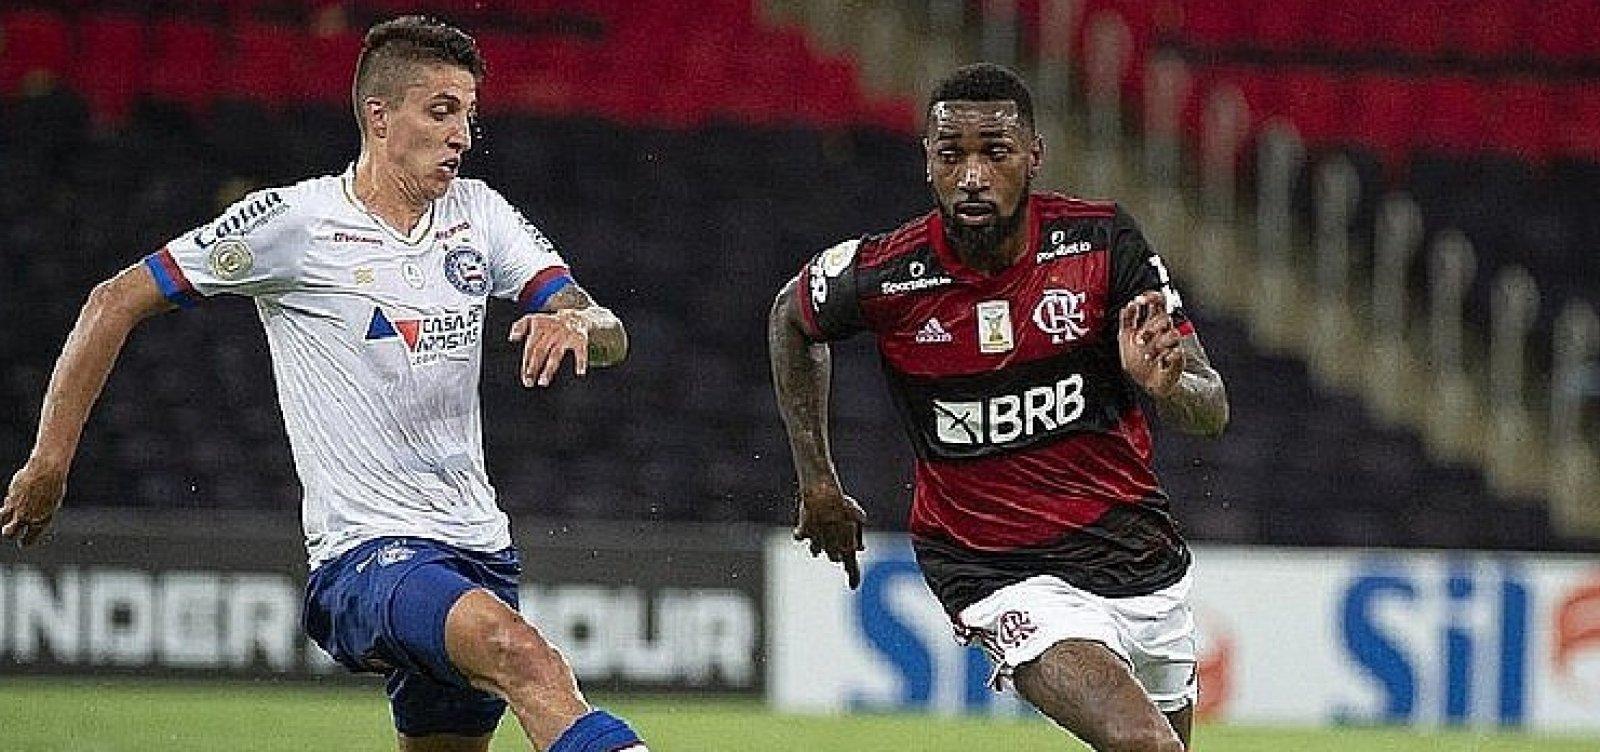 [Bahia defende Ramirez após indiciamento por racismo]